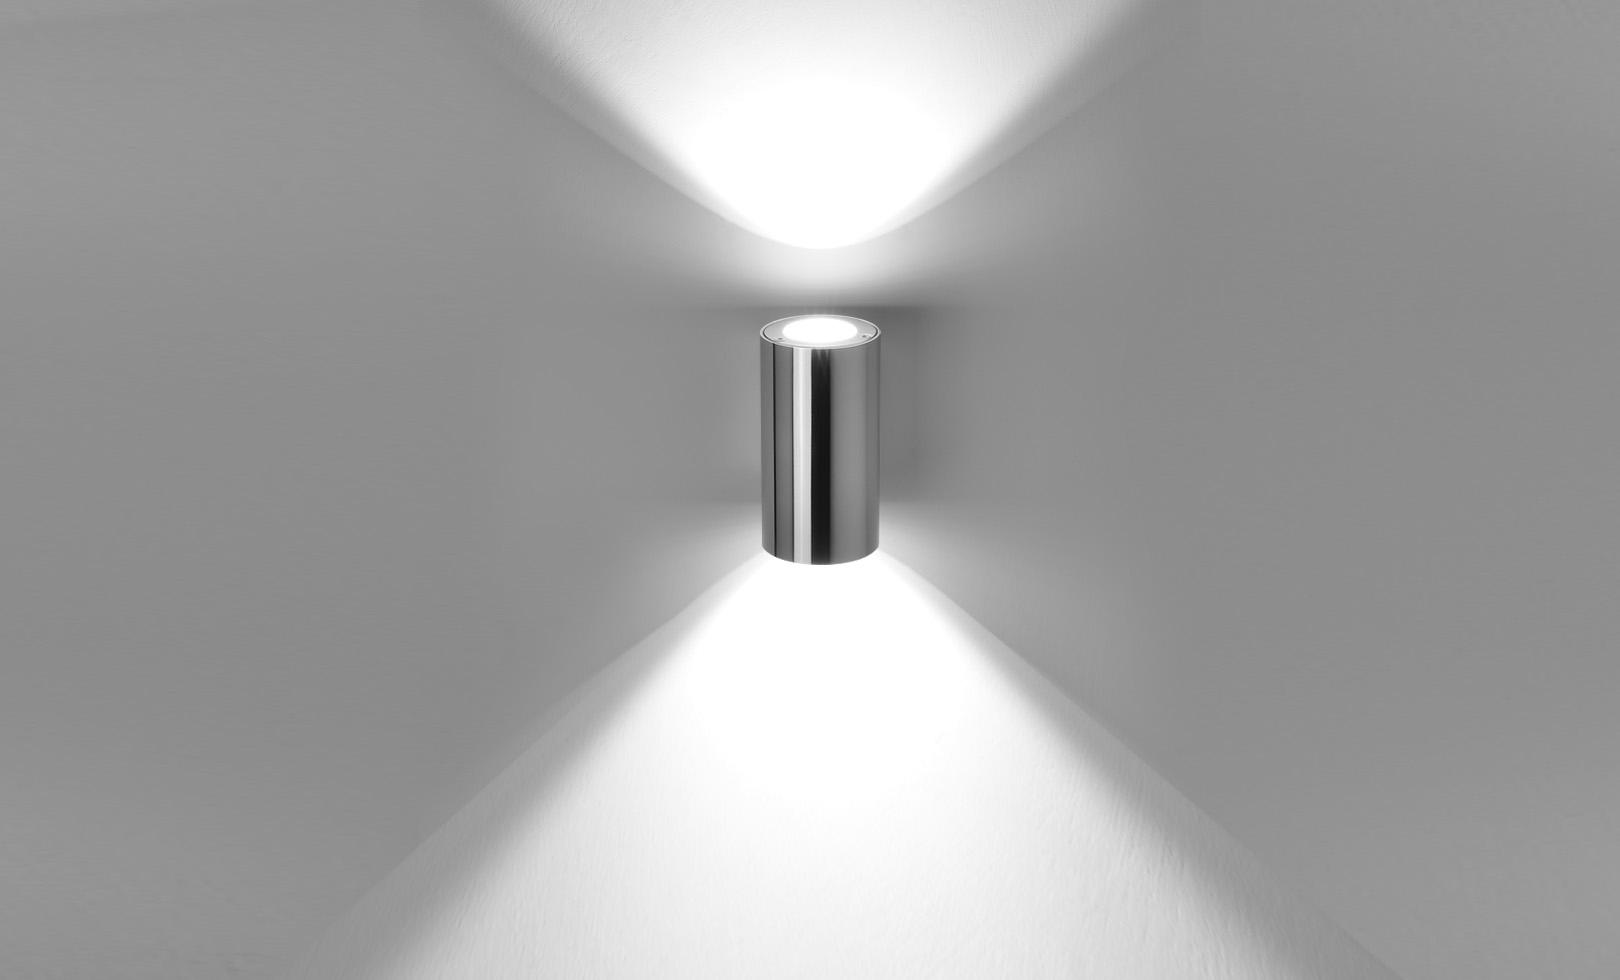 401902 TECH MINI STEEL ROUND 02 LED 2x5W 1